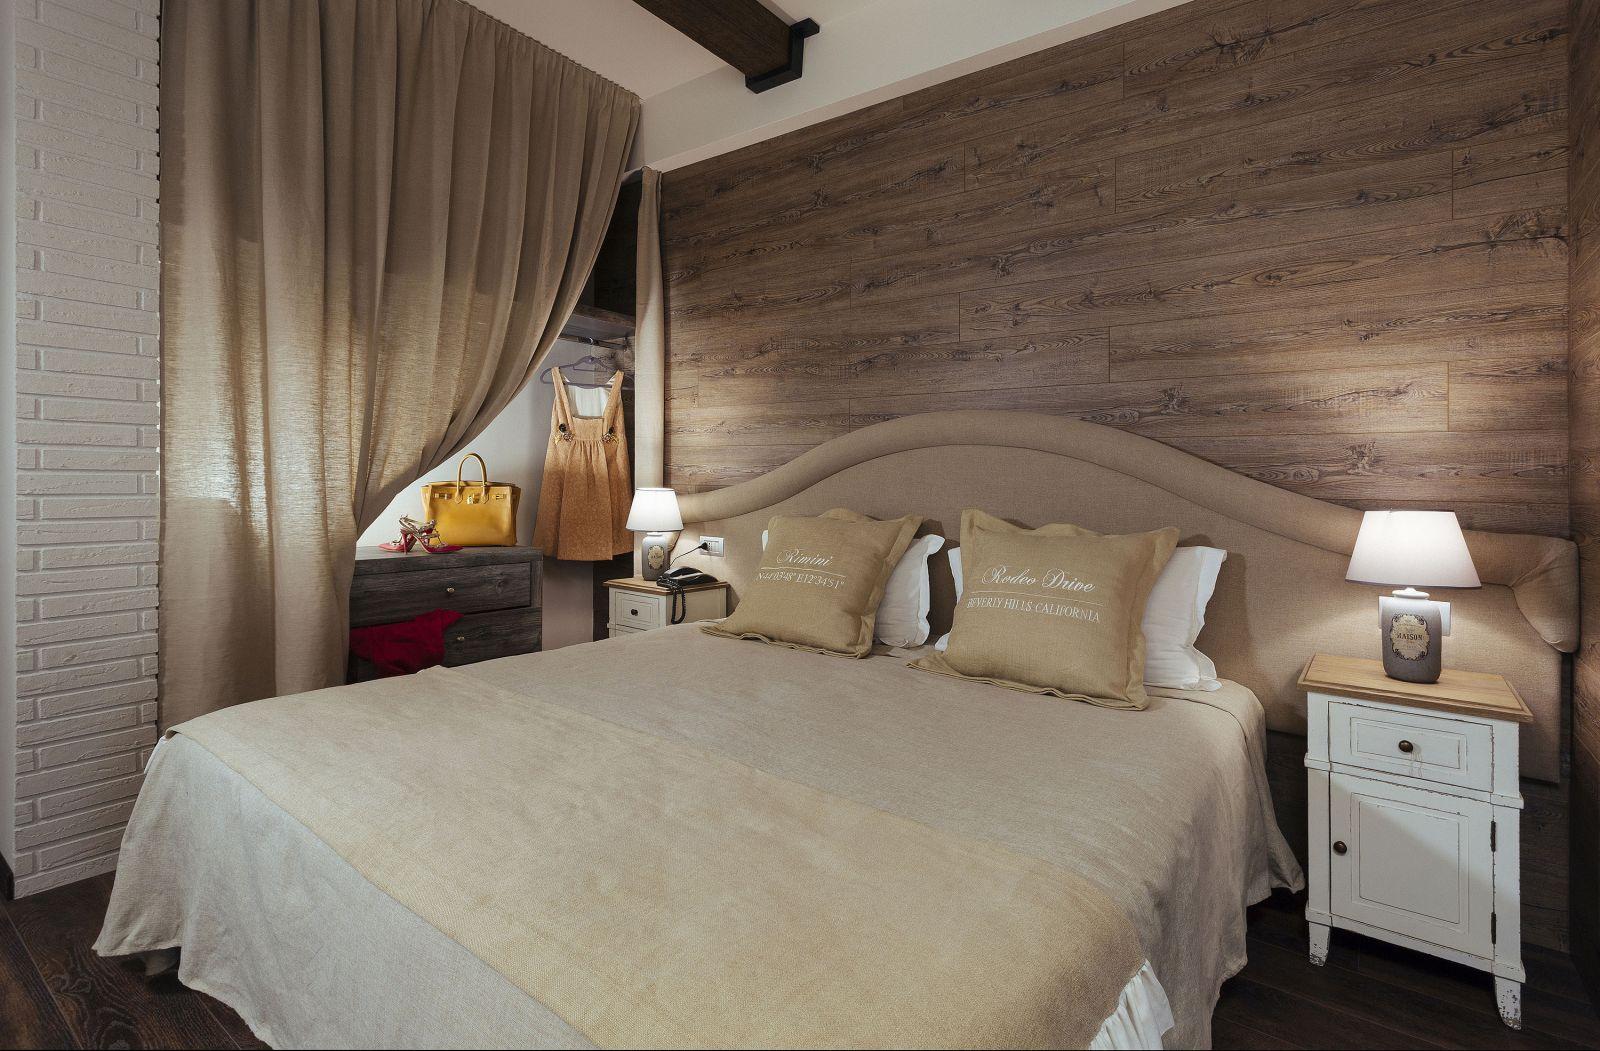 Deluxe Room - Maison B Hotel by Hotel Patrizia & Residenza